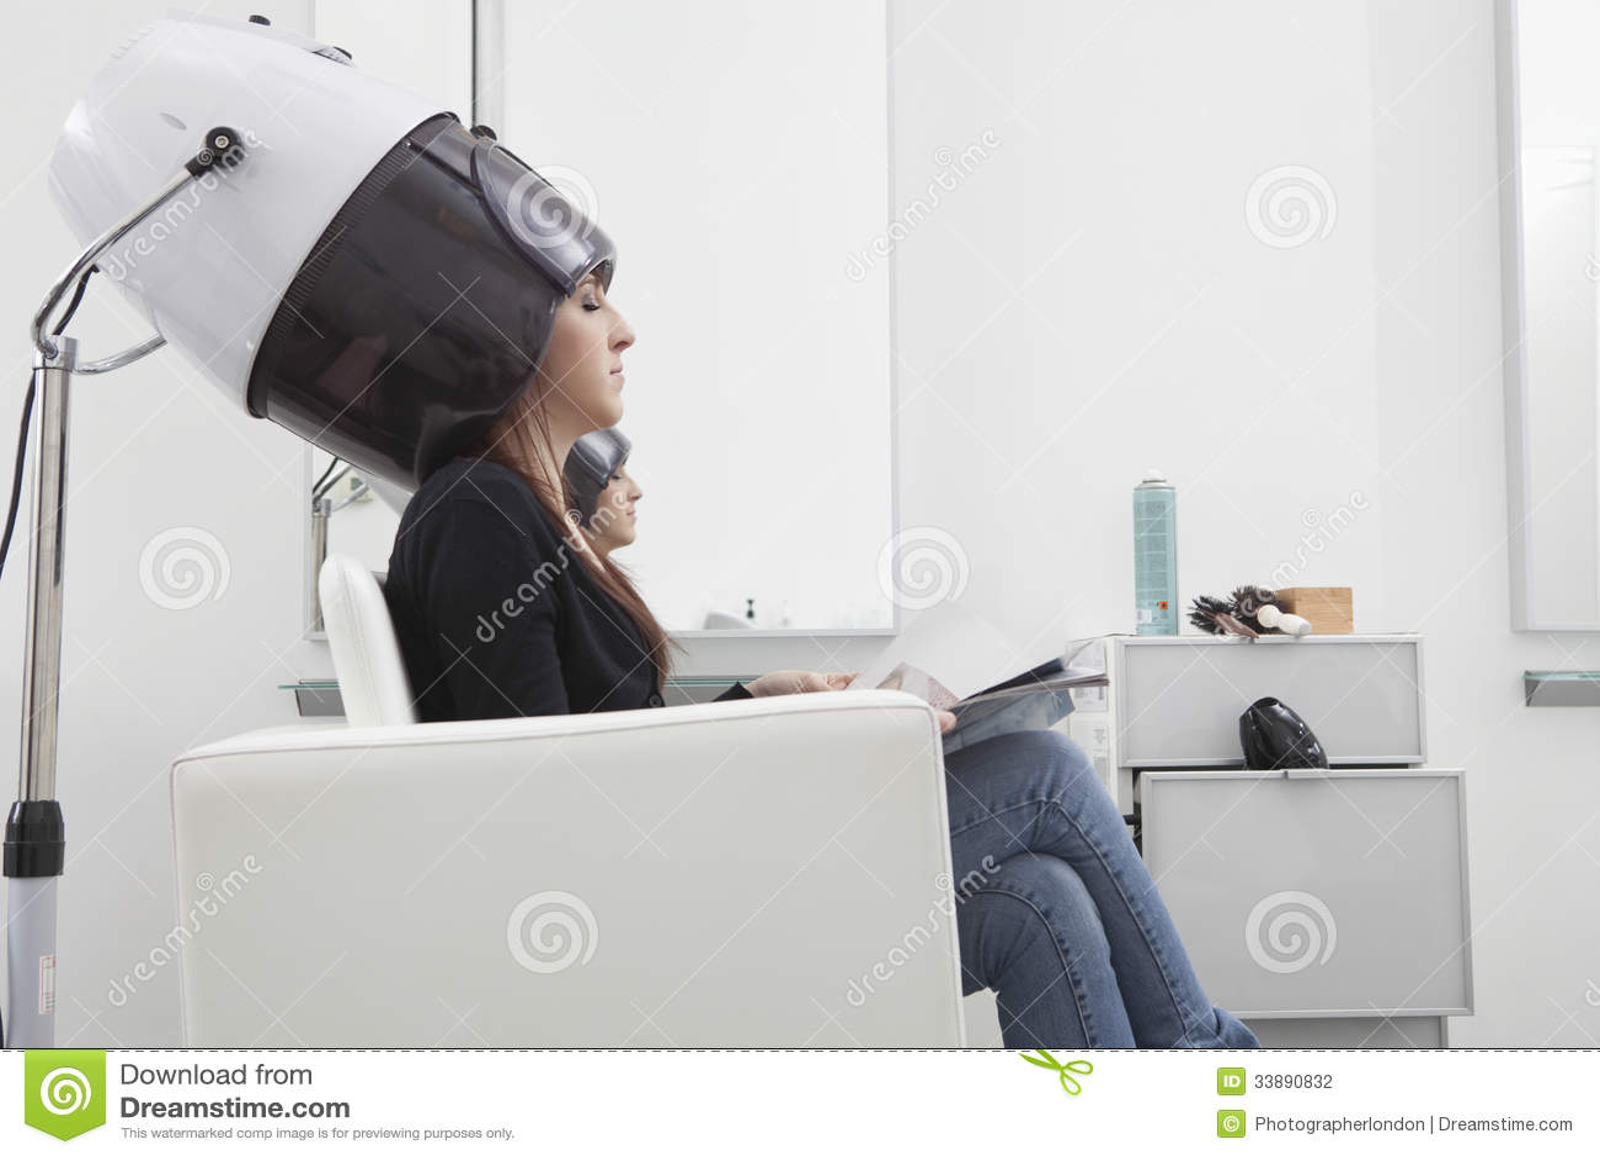 Frau unter mit kapuze trockner maschine im friseursalon stockfoto